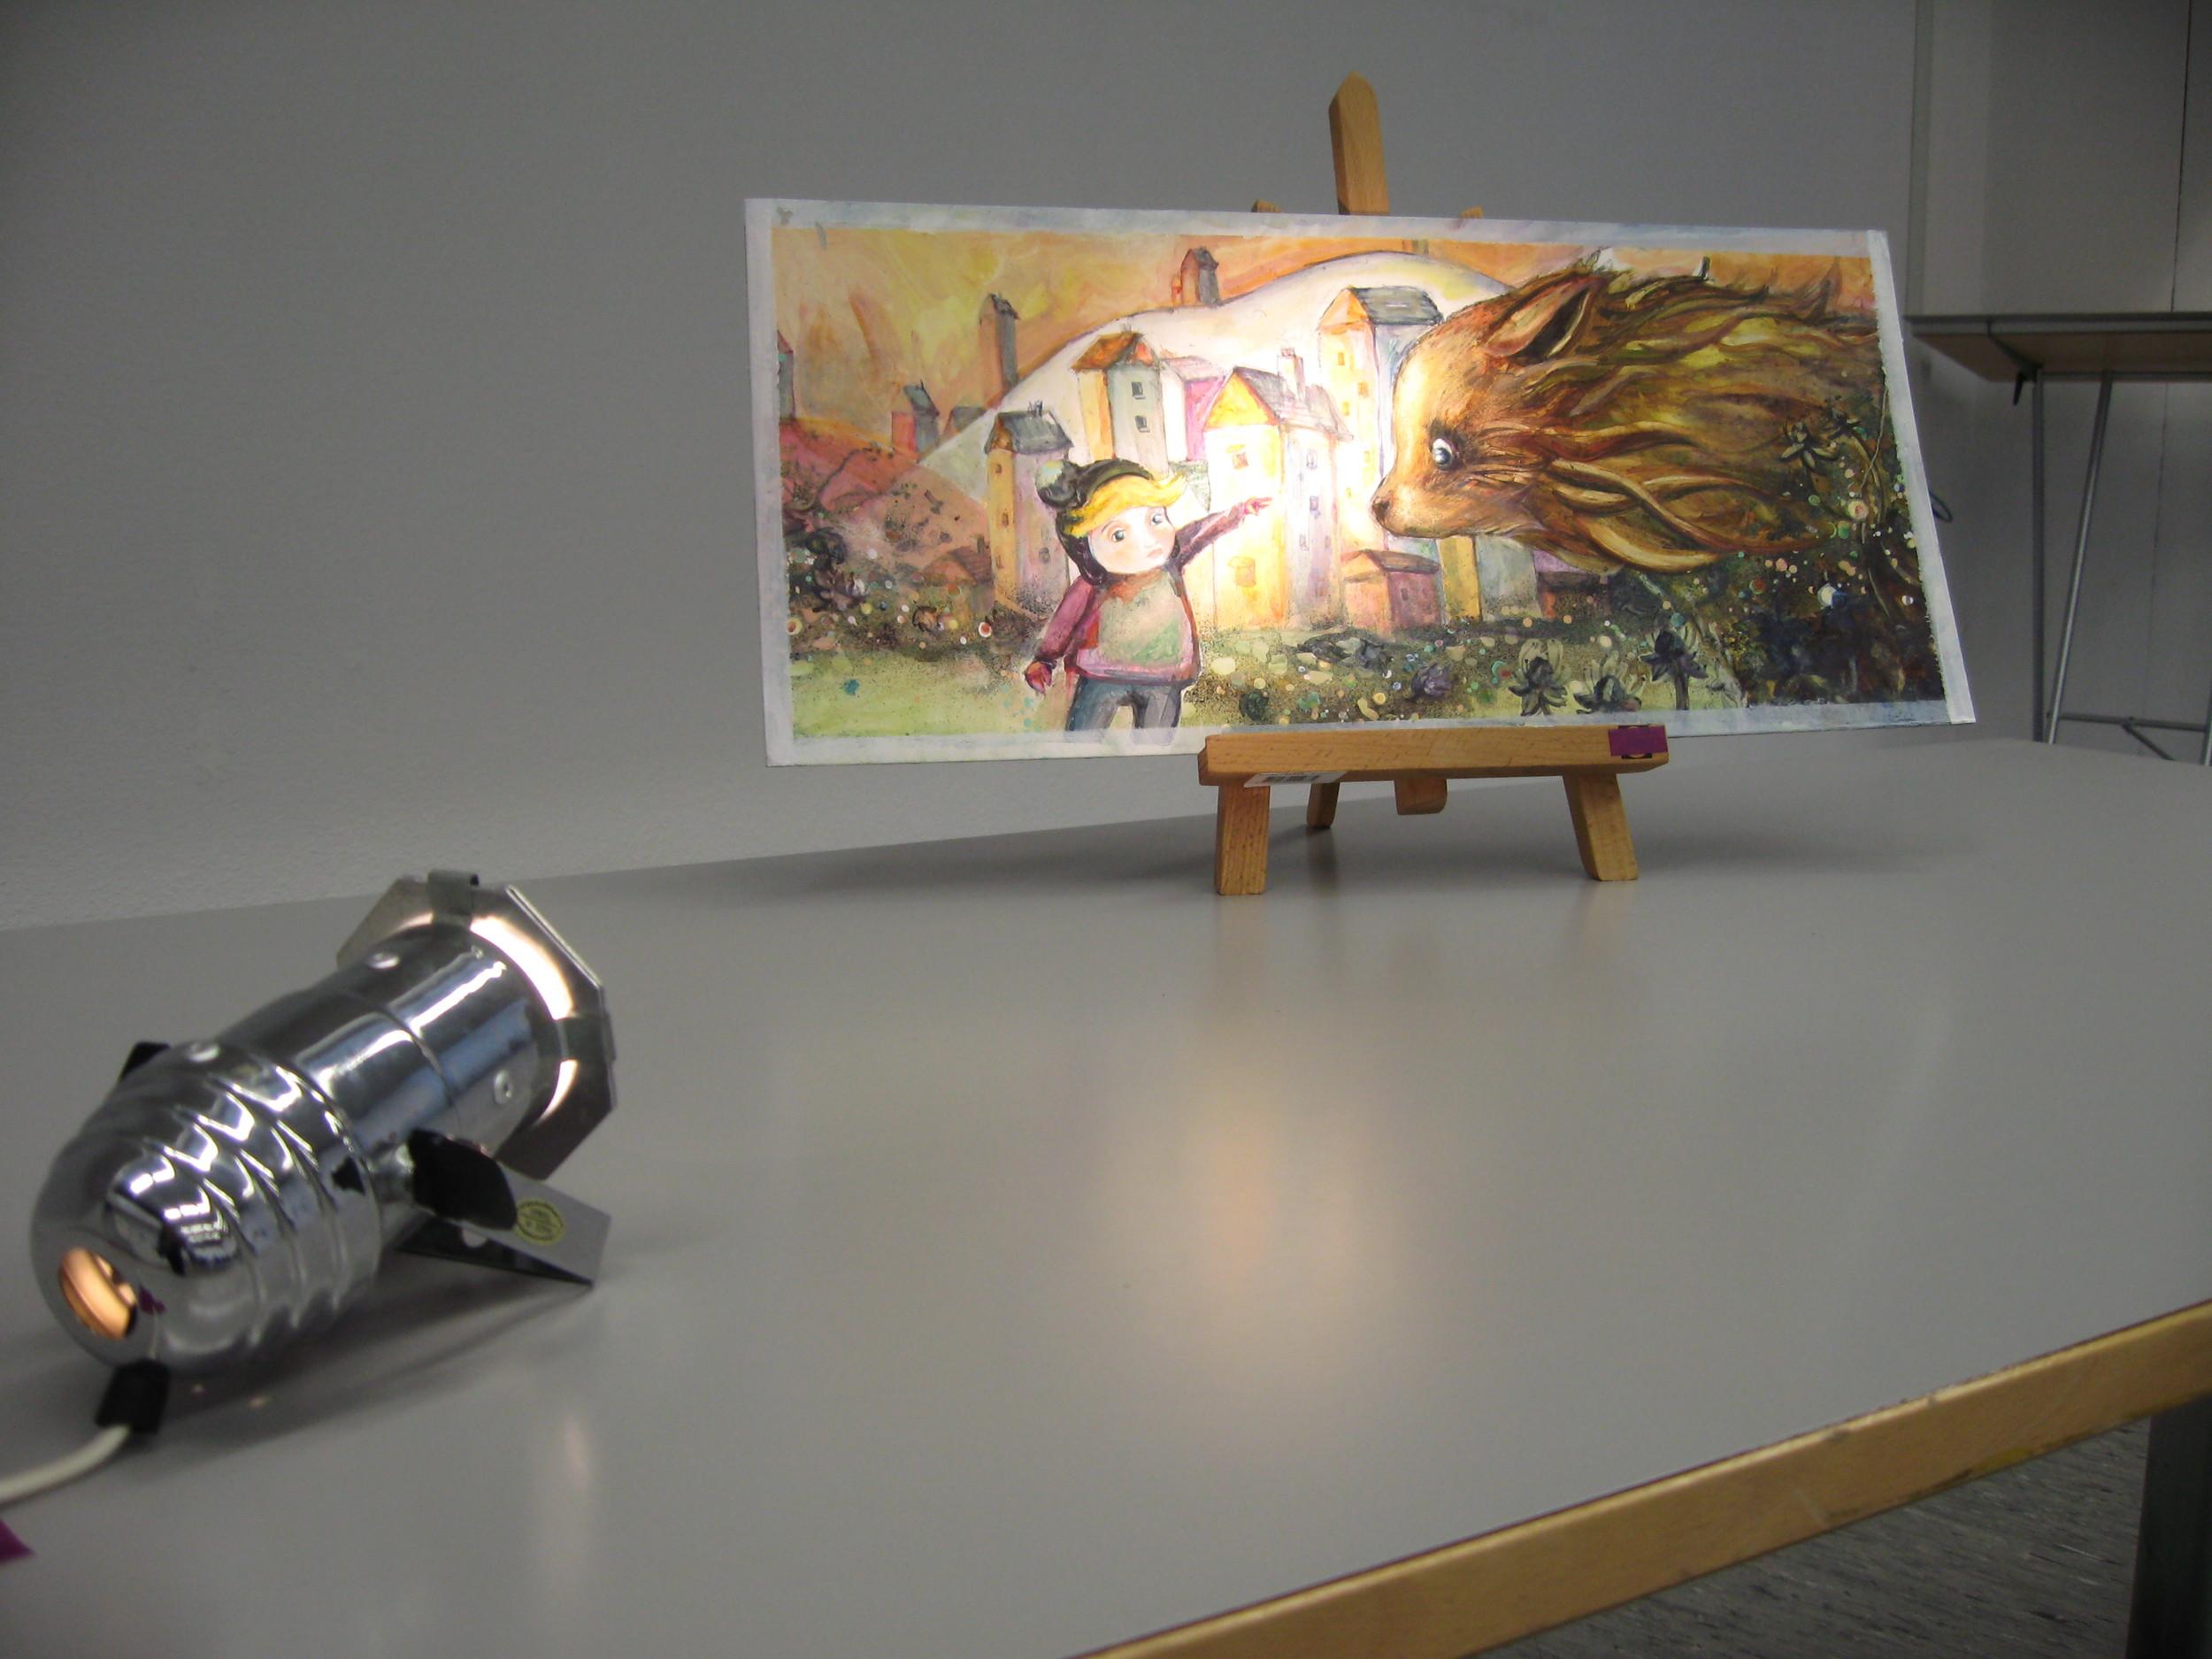 Girl and Wolf (an hommage to Elliot Dear), 2008, Oil on cardboard (25 x 55cm), lightspot.